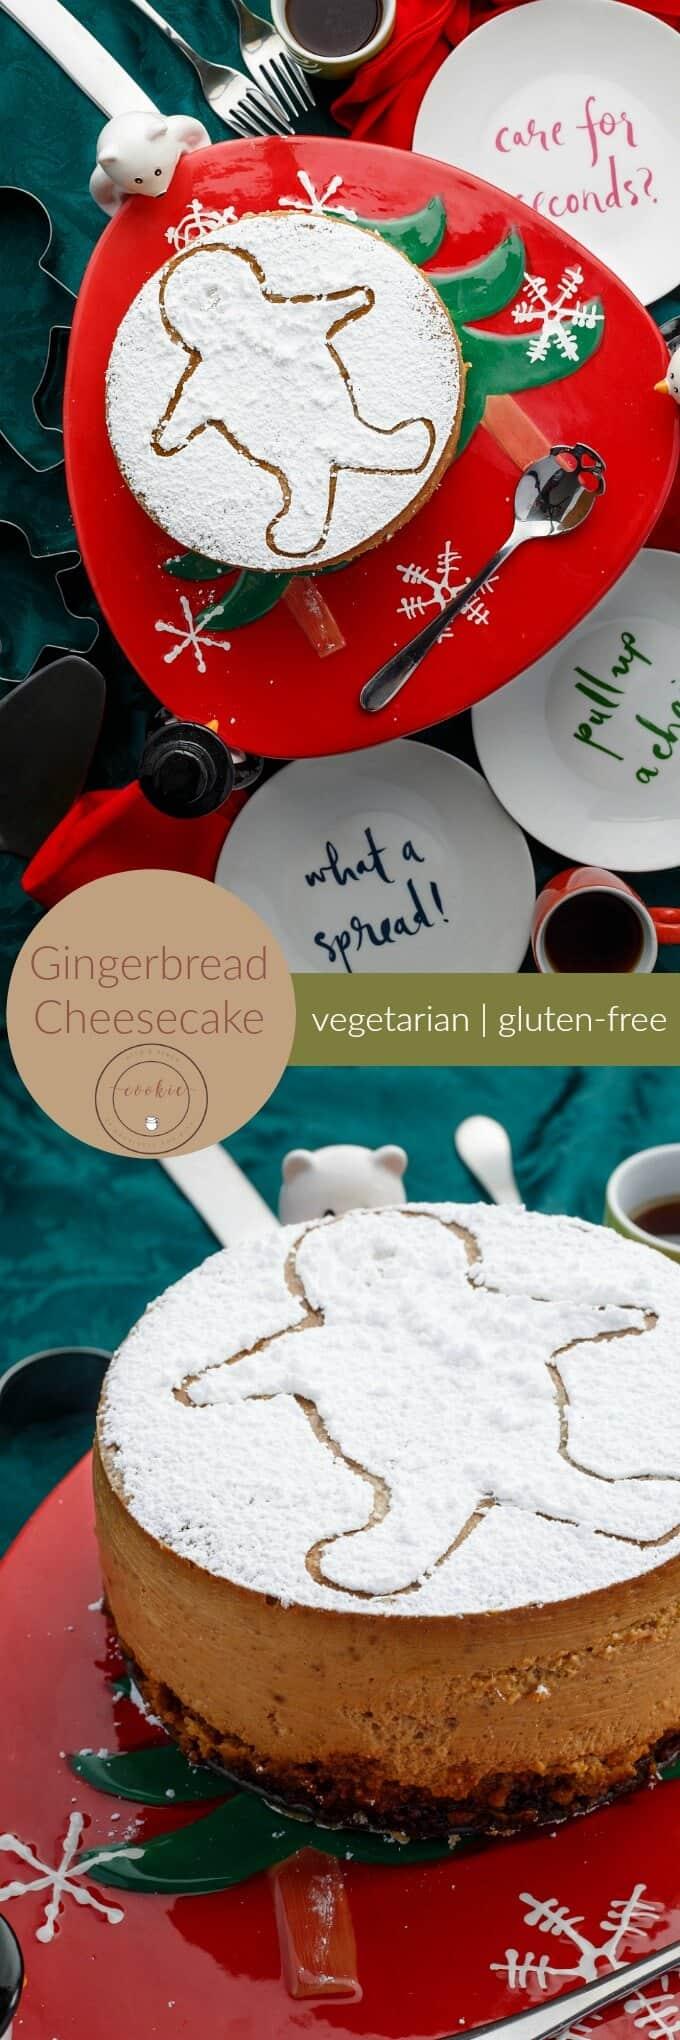 gingerbread-cheesecake